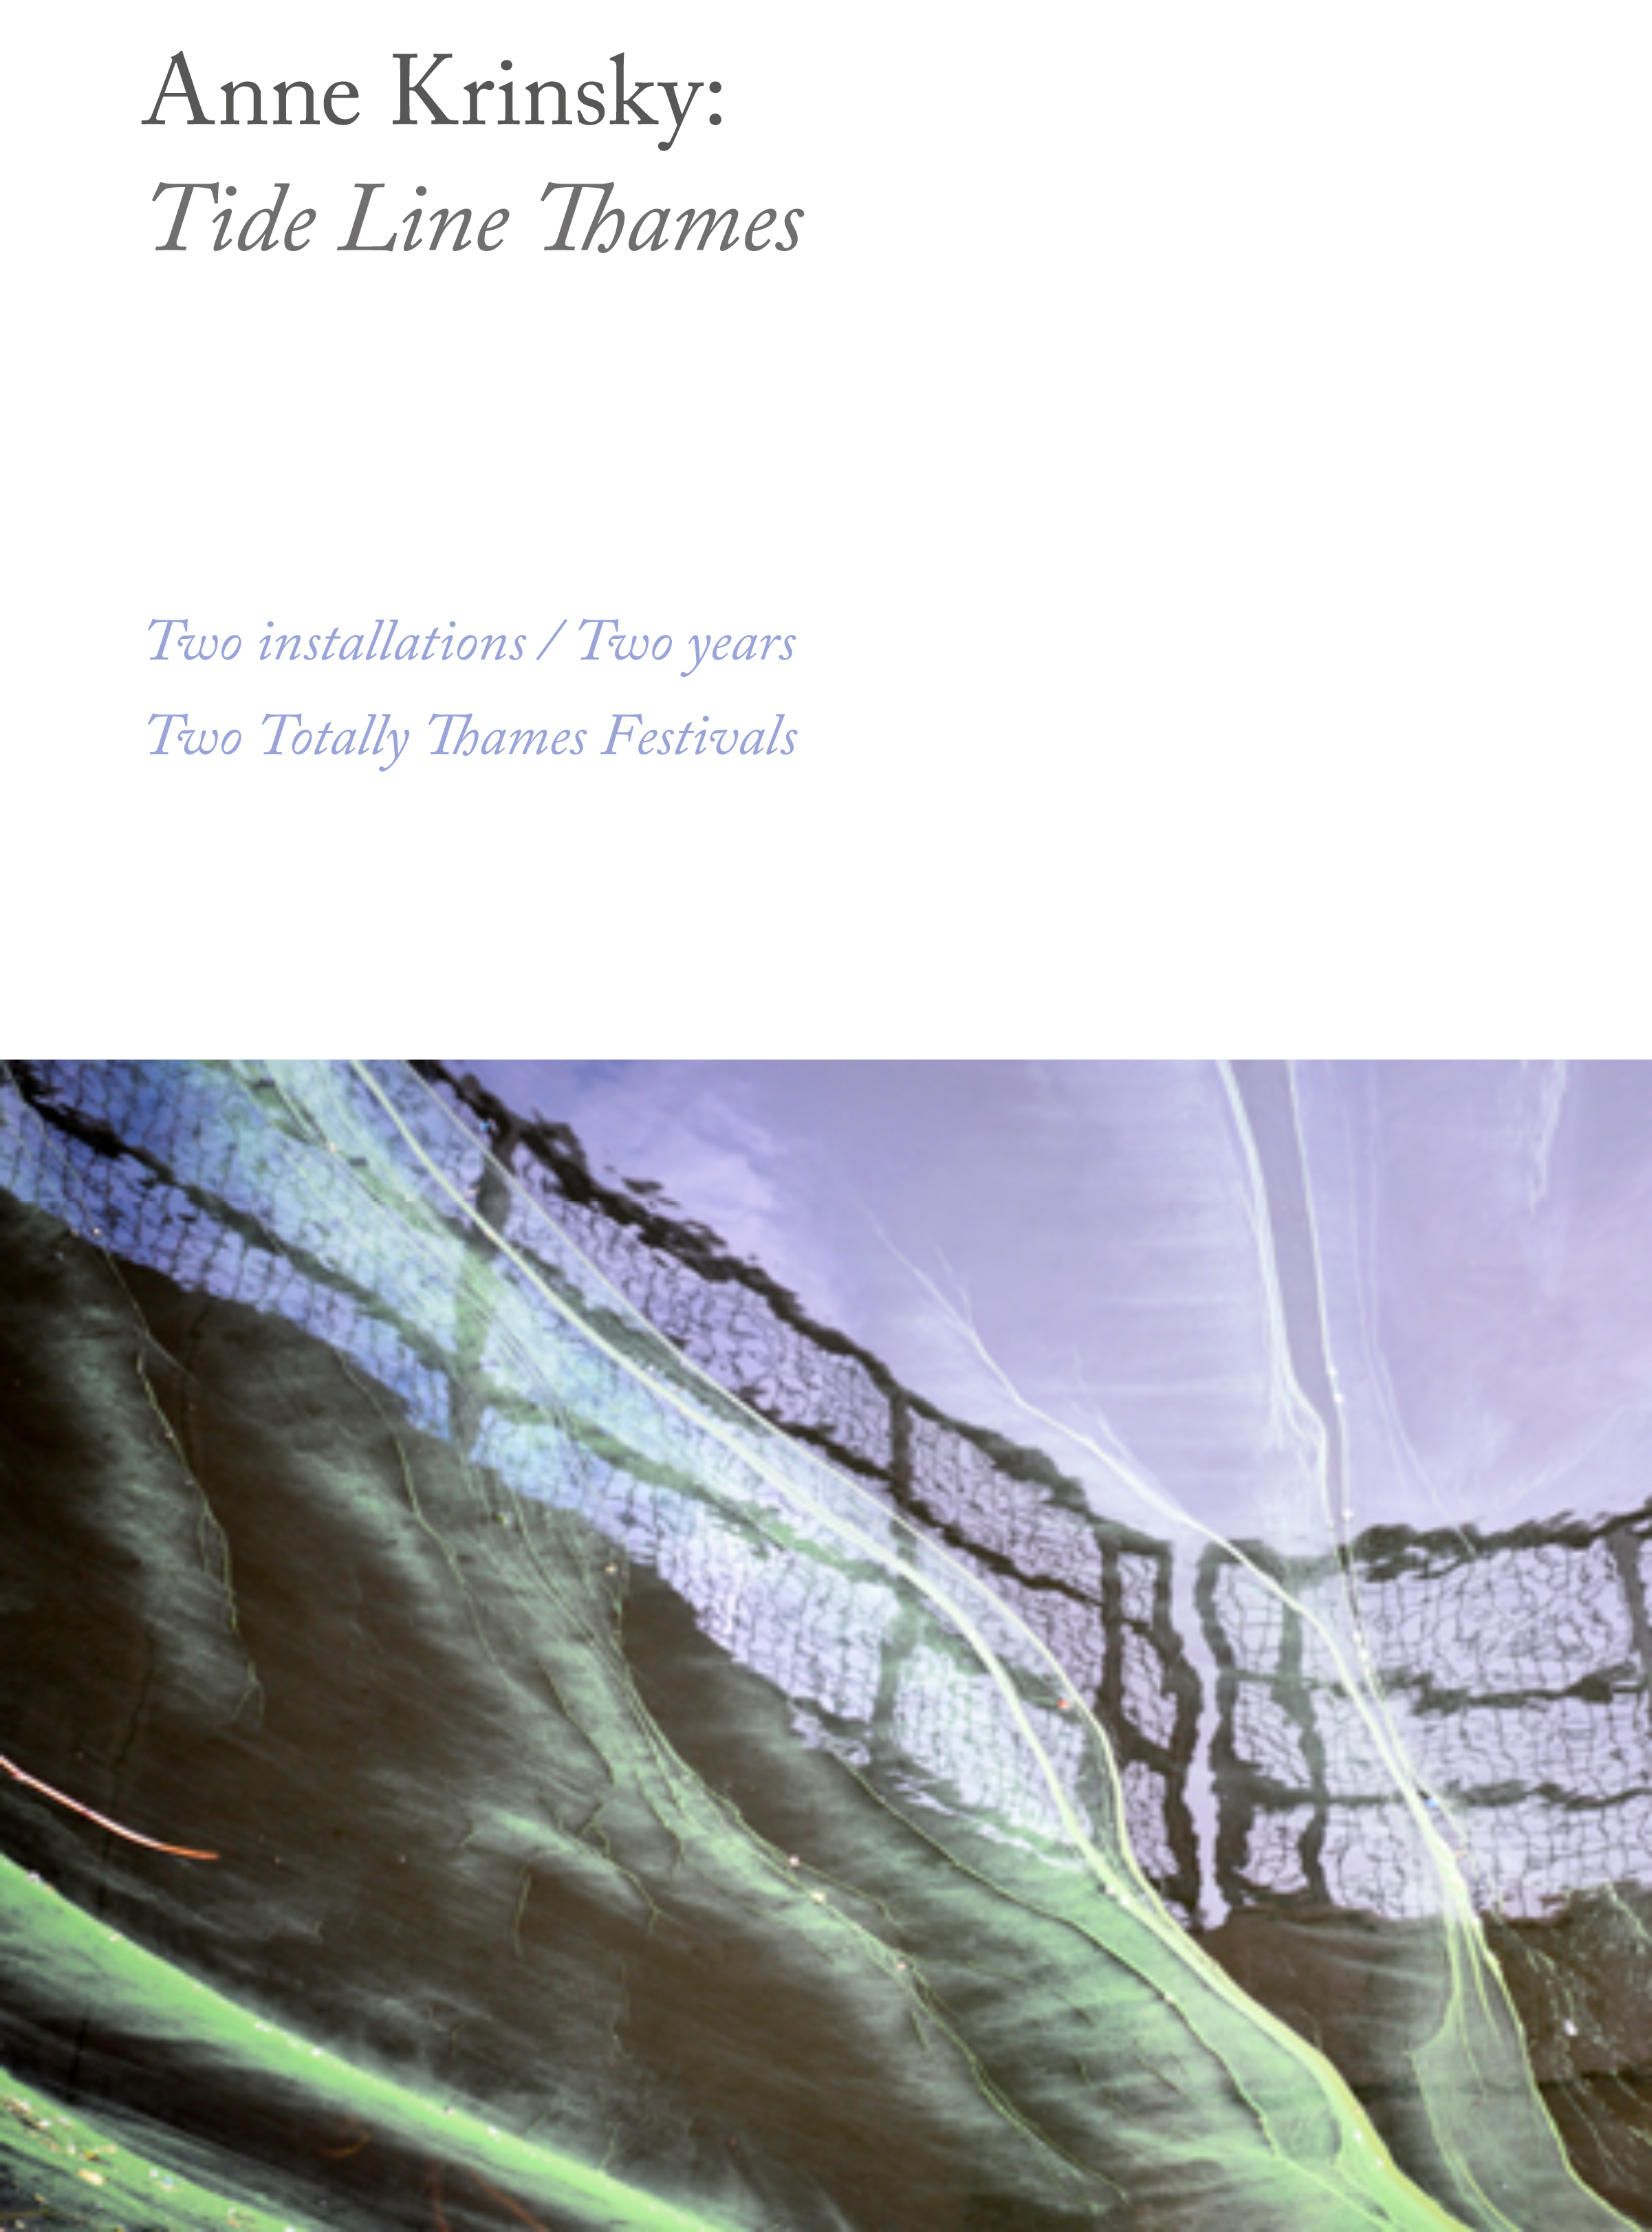 1 Anne_Krinsky_Tide Line Thames Catalogue Cover.jpg